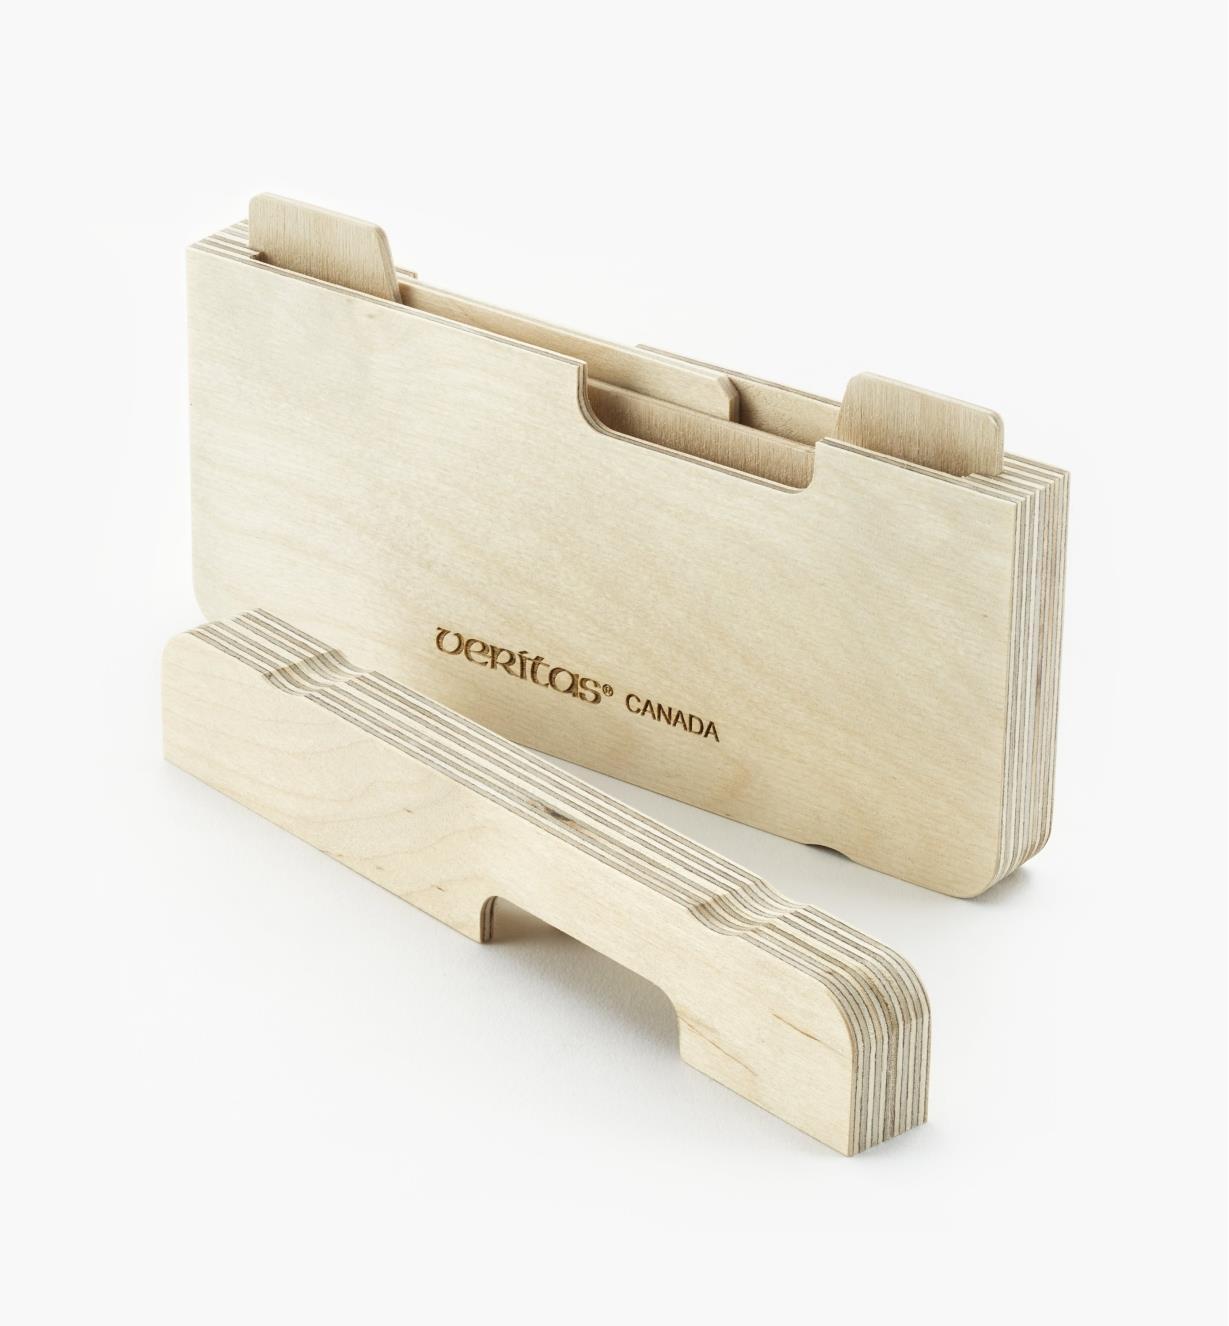 05P5903 - Blade Box